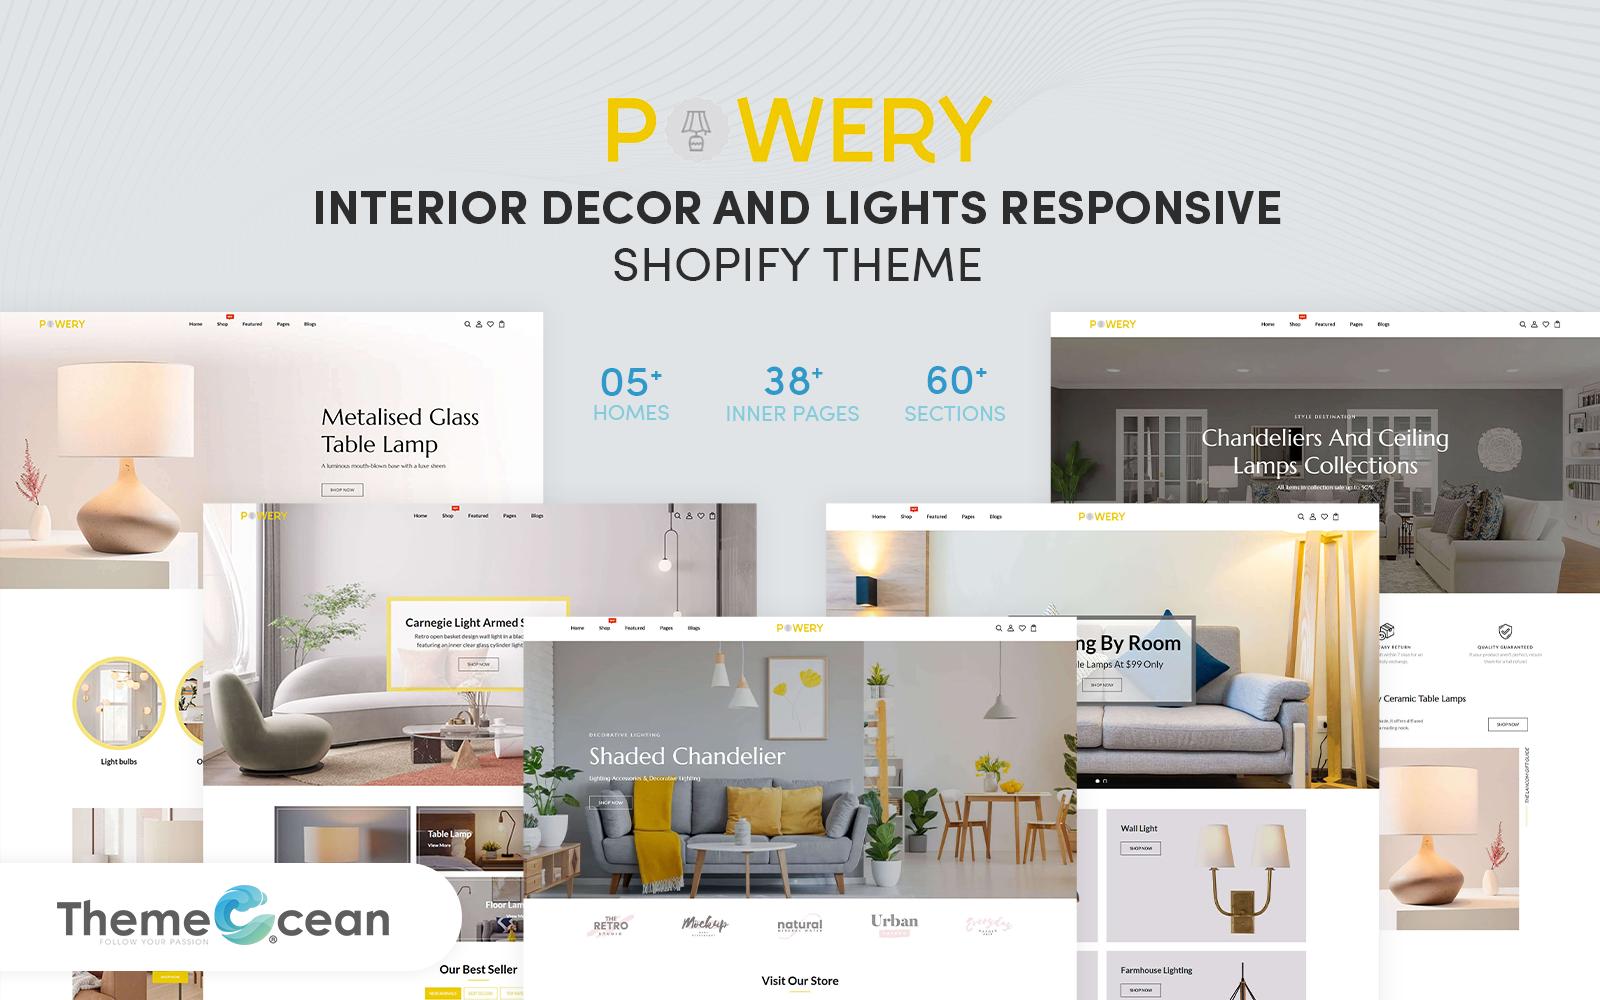 Powery - Interior Decor & Lights Responsive Shopify Theme